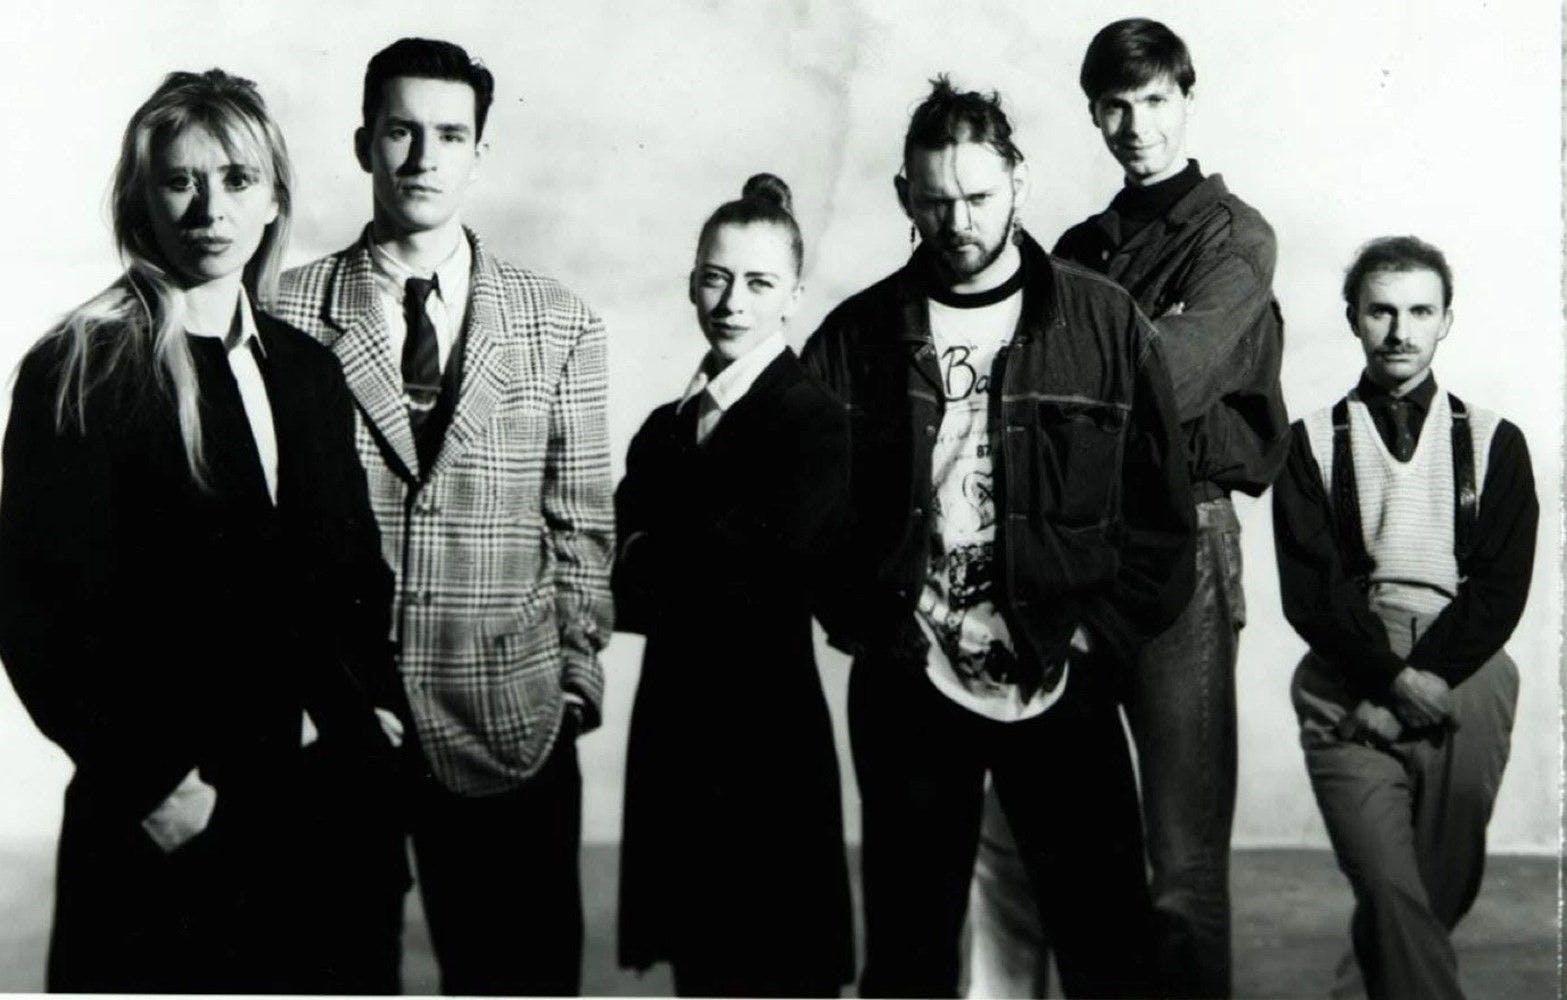 The Antwerp Six, comprised of Ann Demeulemeester, Dries van Noten, Dirk Bikkembergs, Marina Yee, Walter Van Beirendonck, and Dirk Van Saene, is one of the most influential groups in fashion.